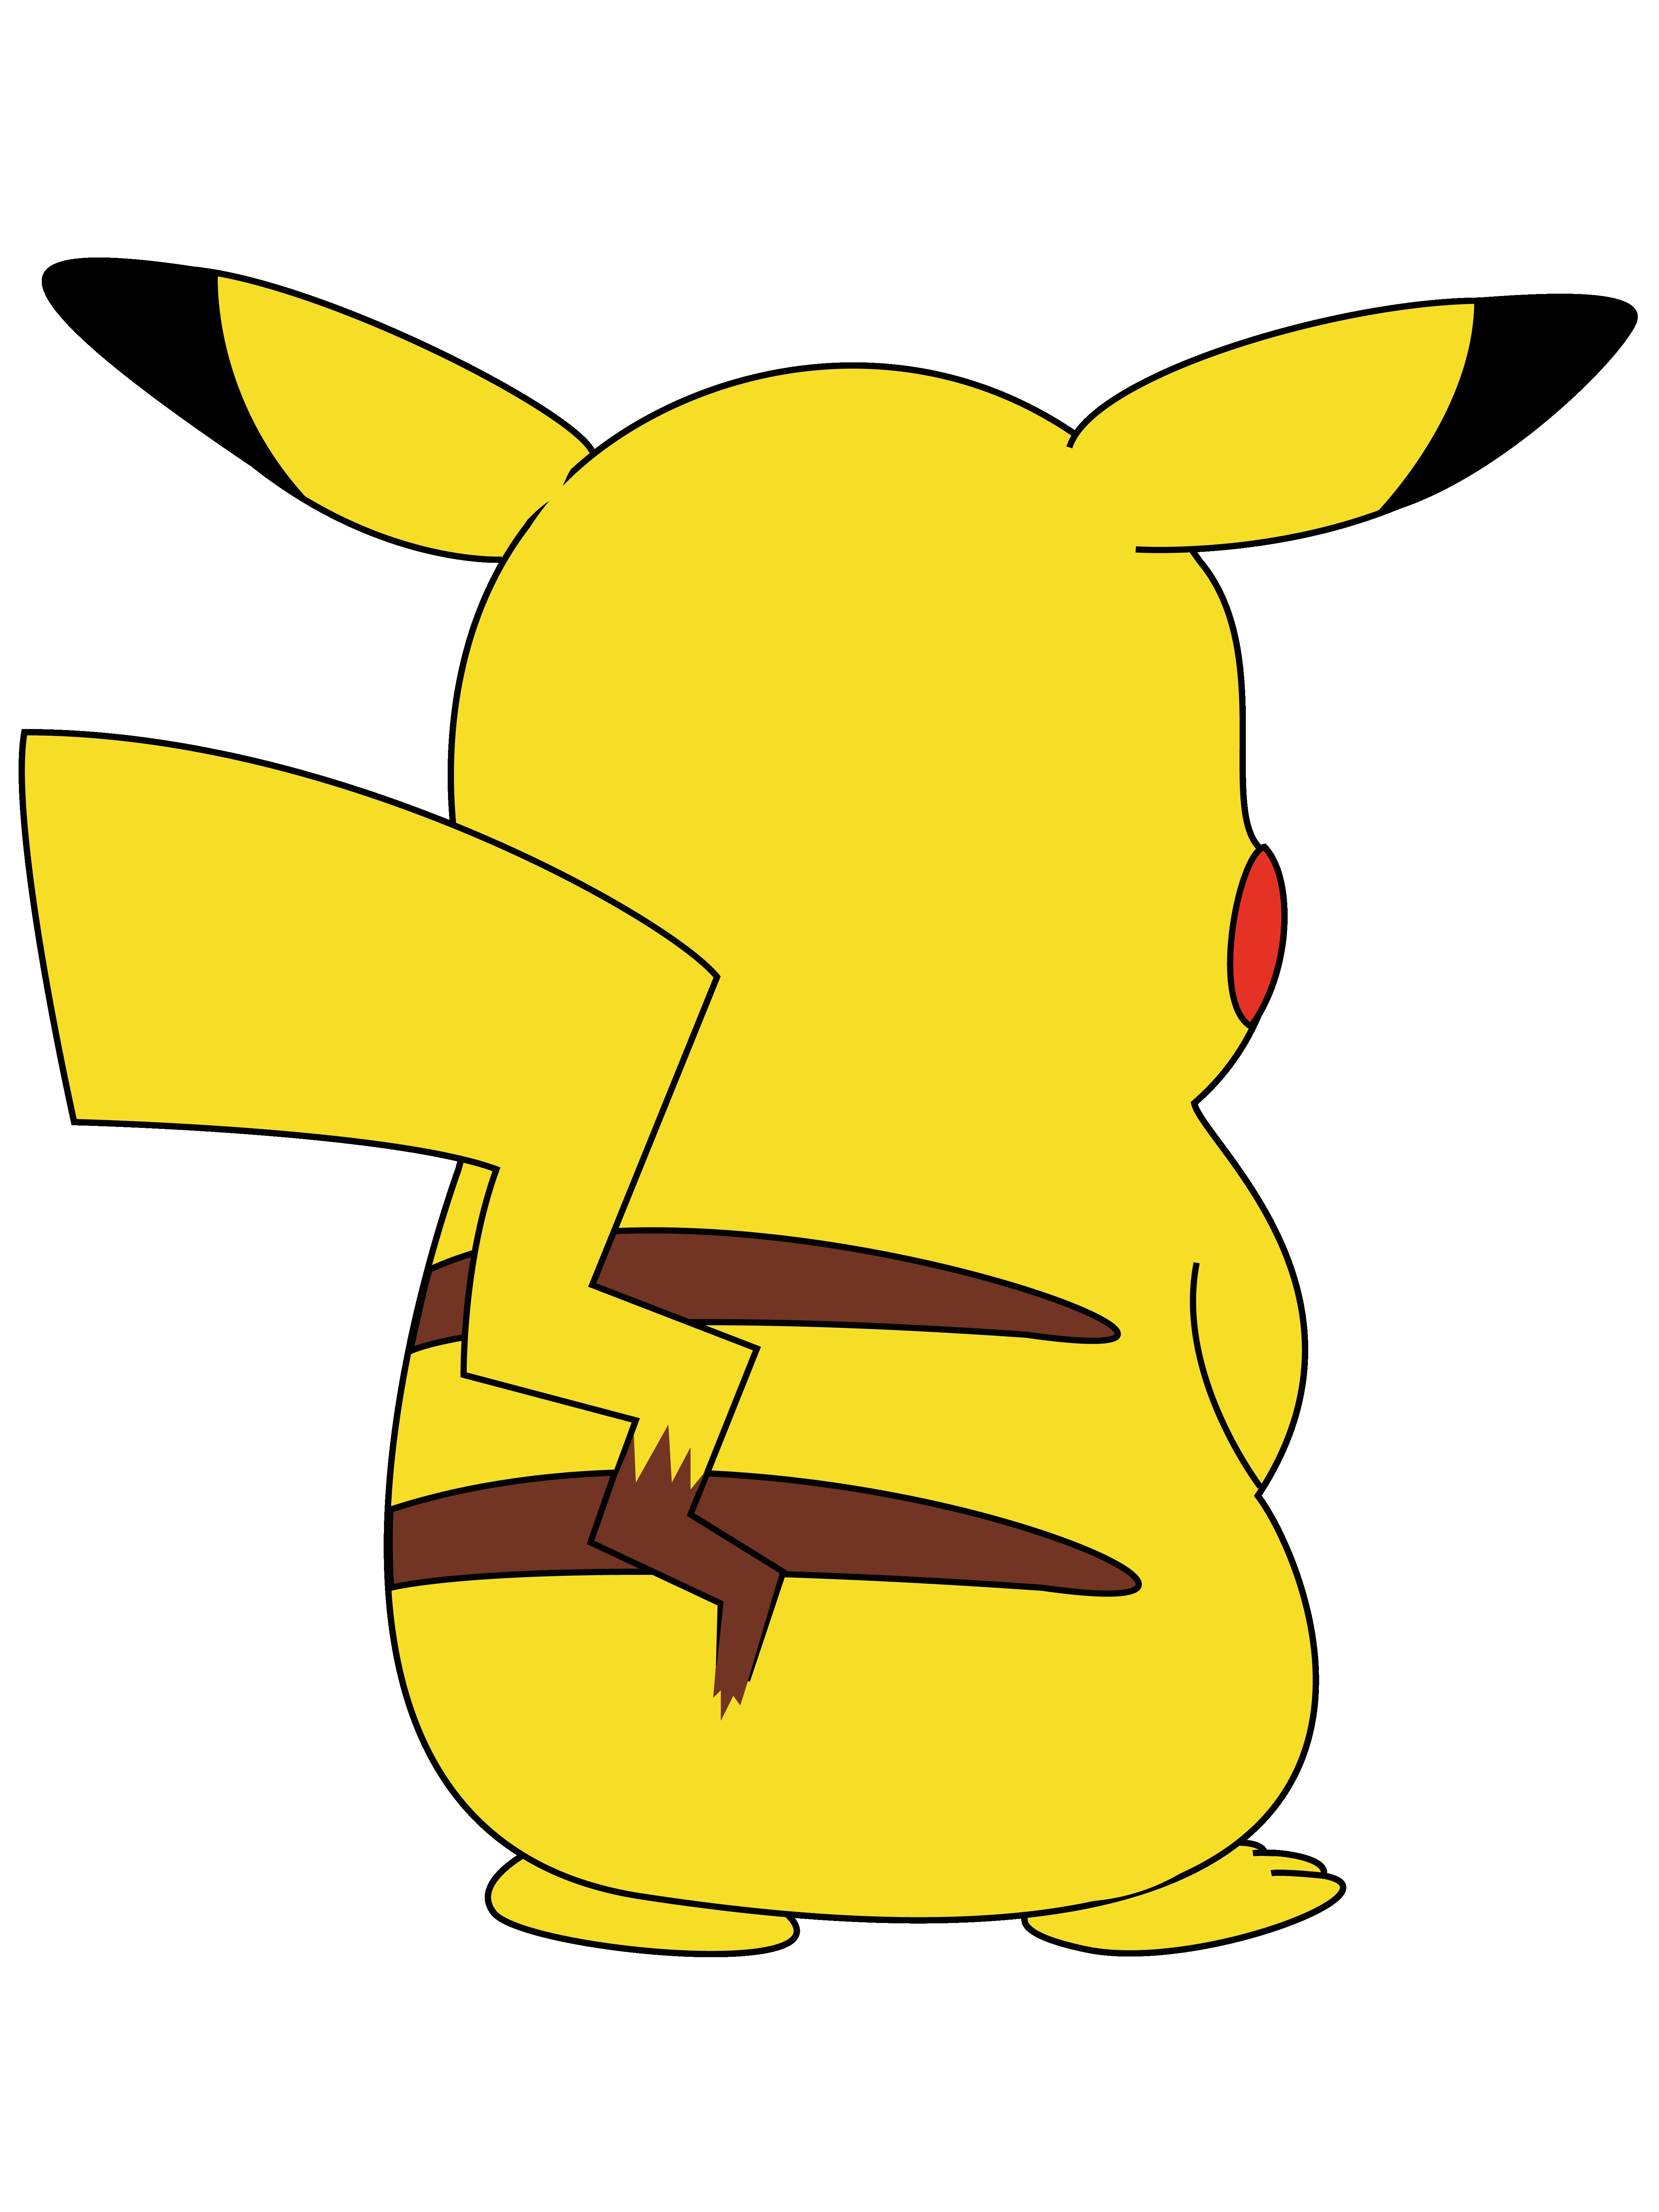 Pikachu clipart thunderbolt. S back shirt by